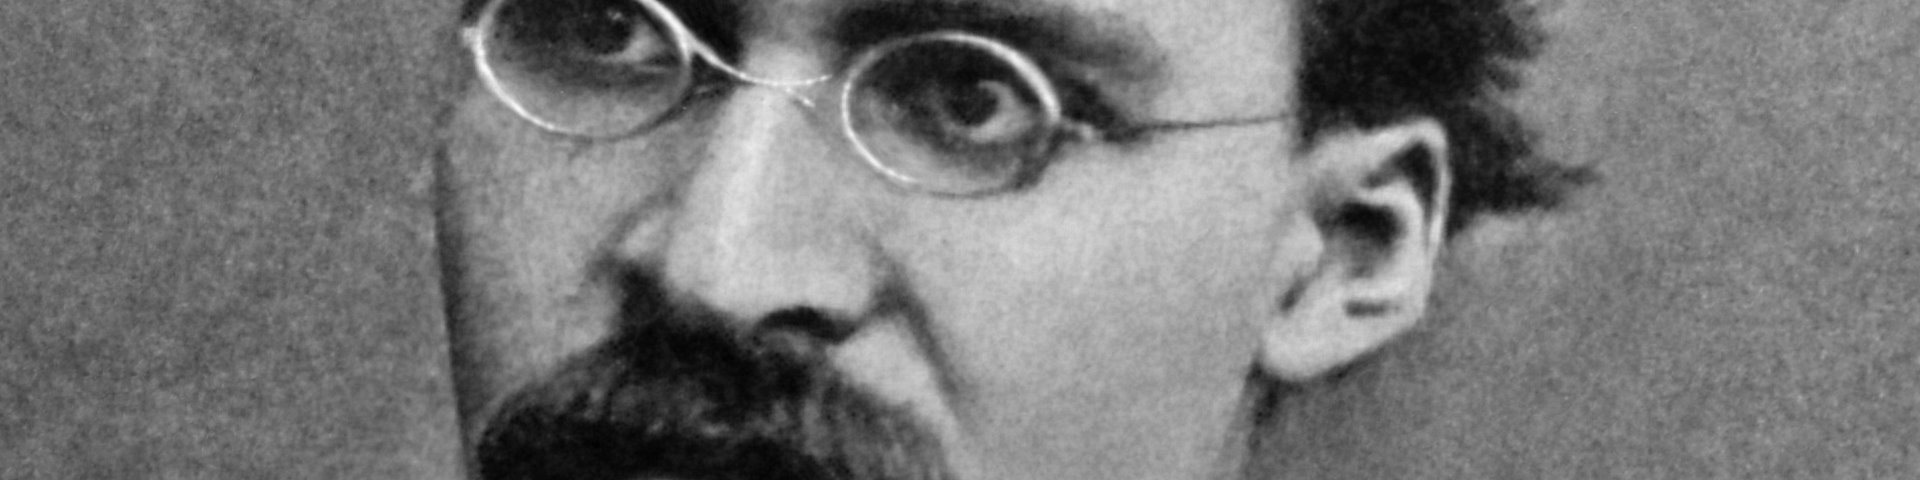 The interest in and relevance of Nietzsche's philosophy today